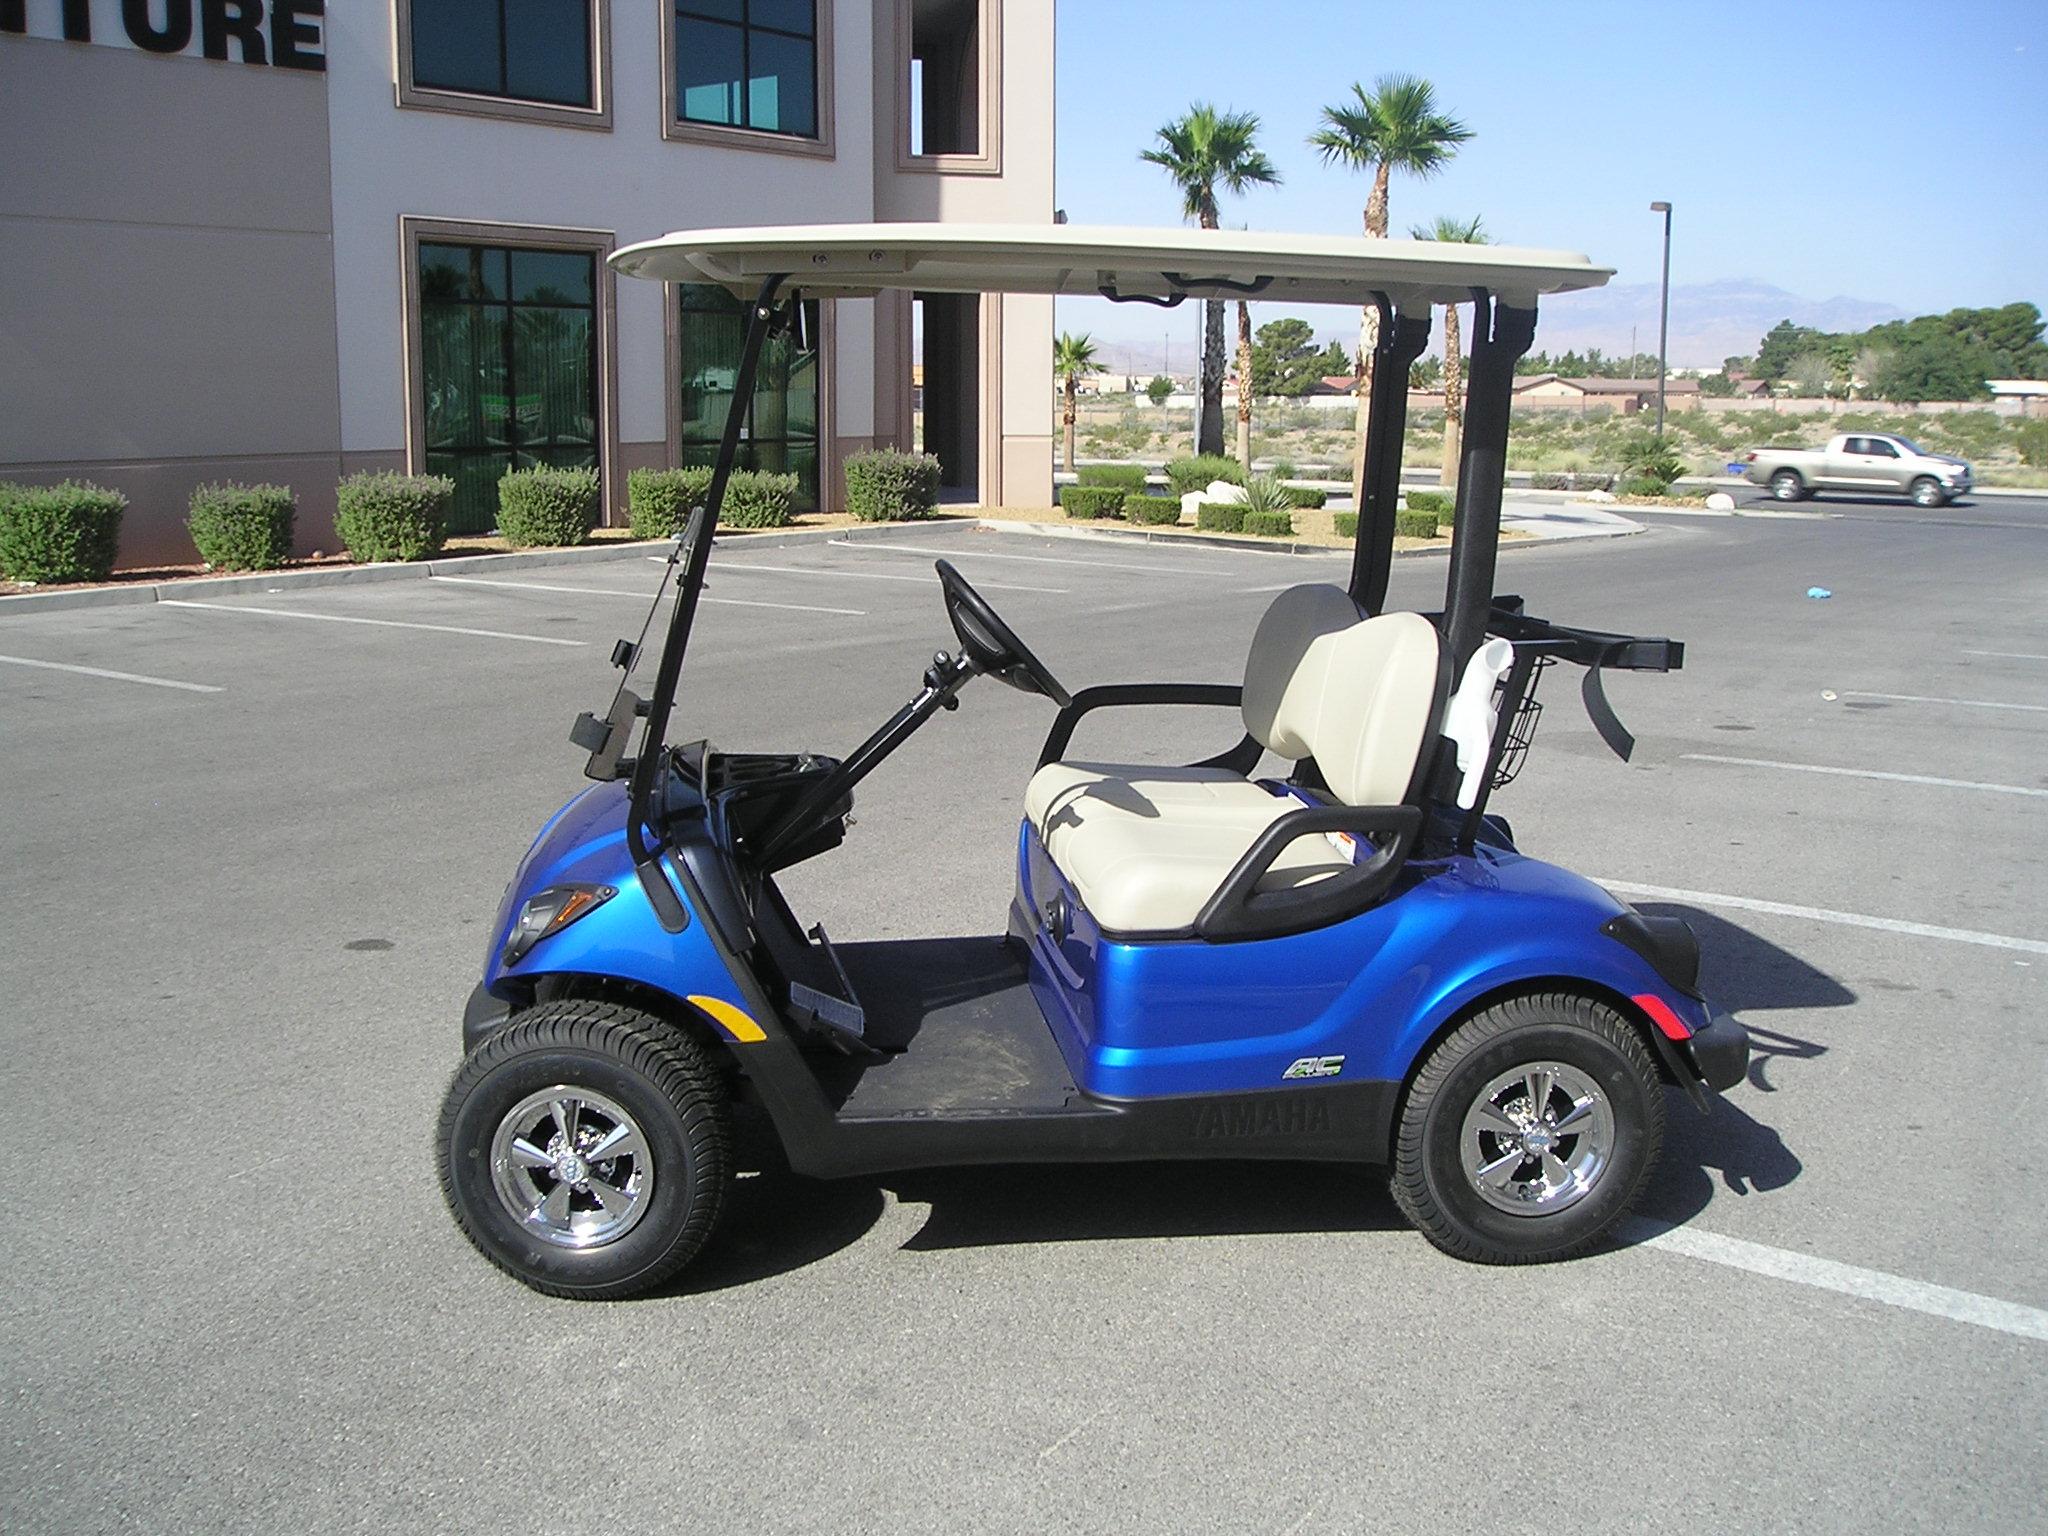 yamaha golf carts oklahoma volvo 850 wiring diagram 2016 ac drive ptv  larimar blue wheels in motion